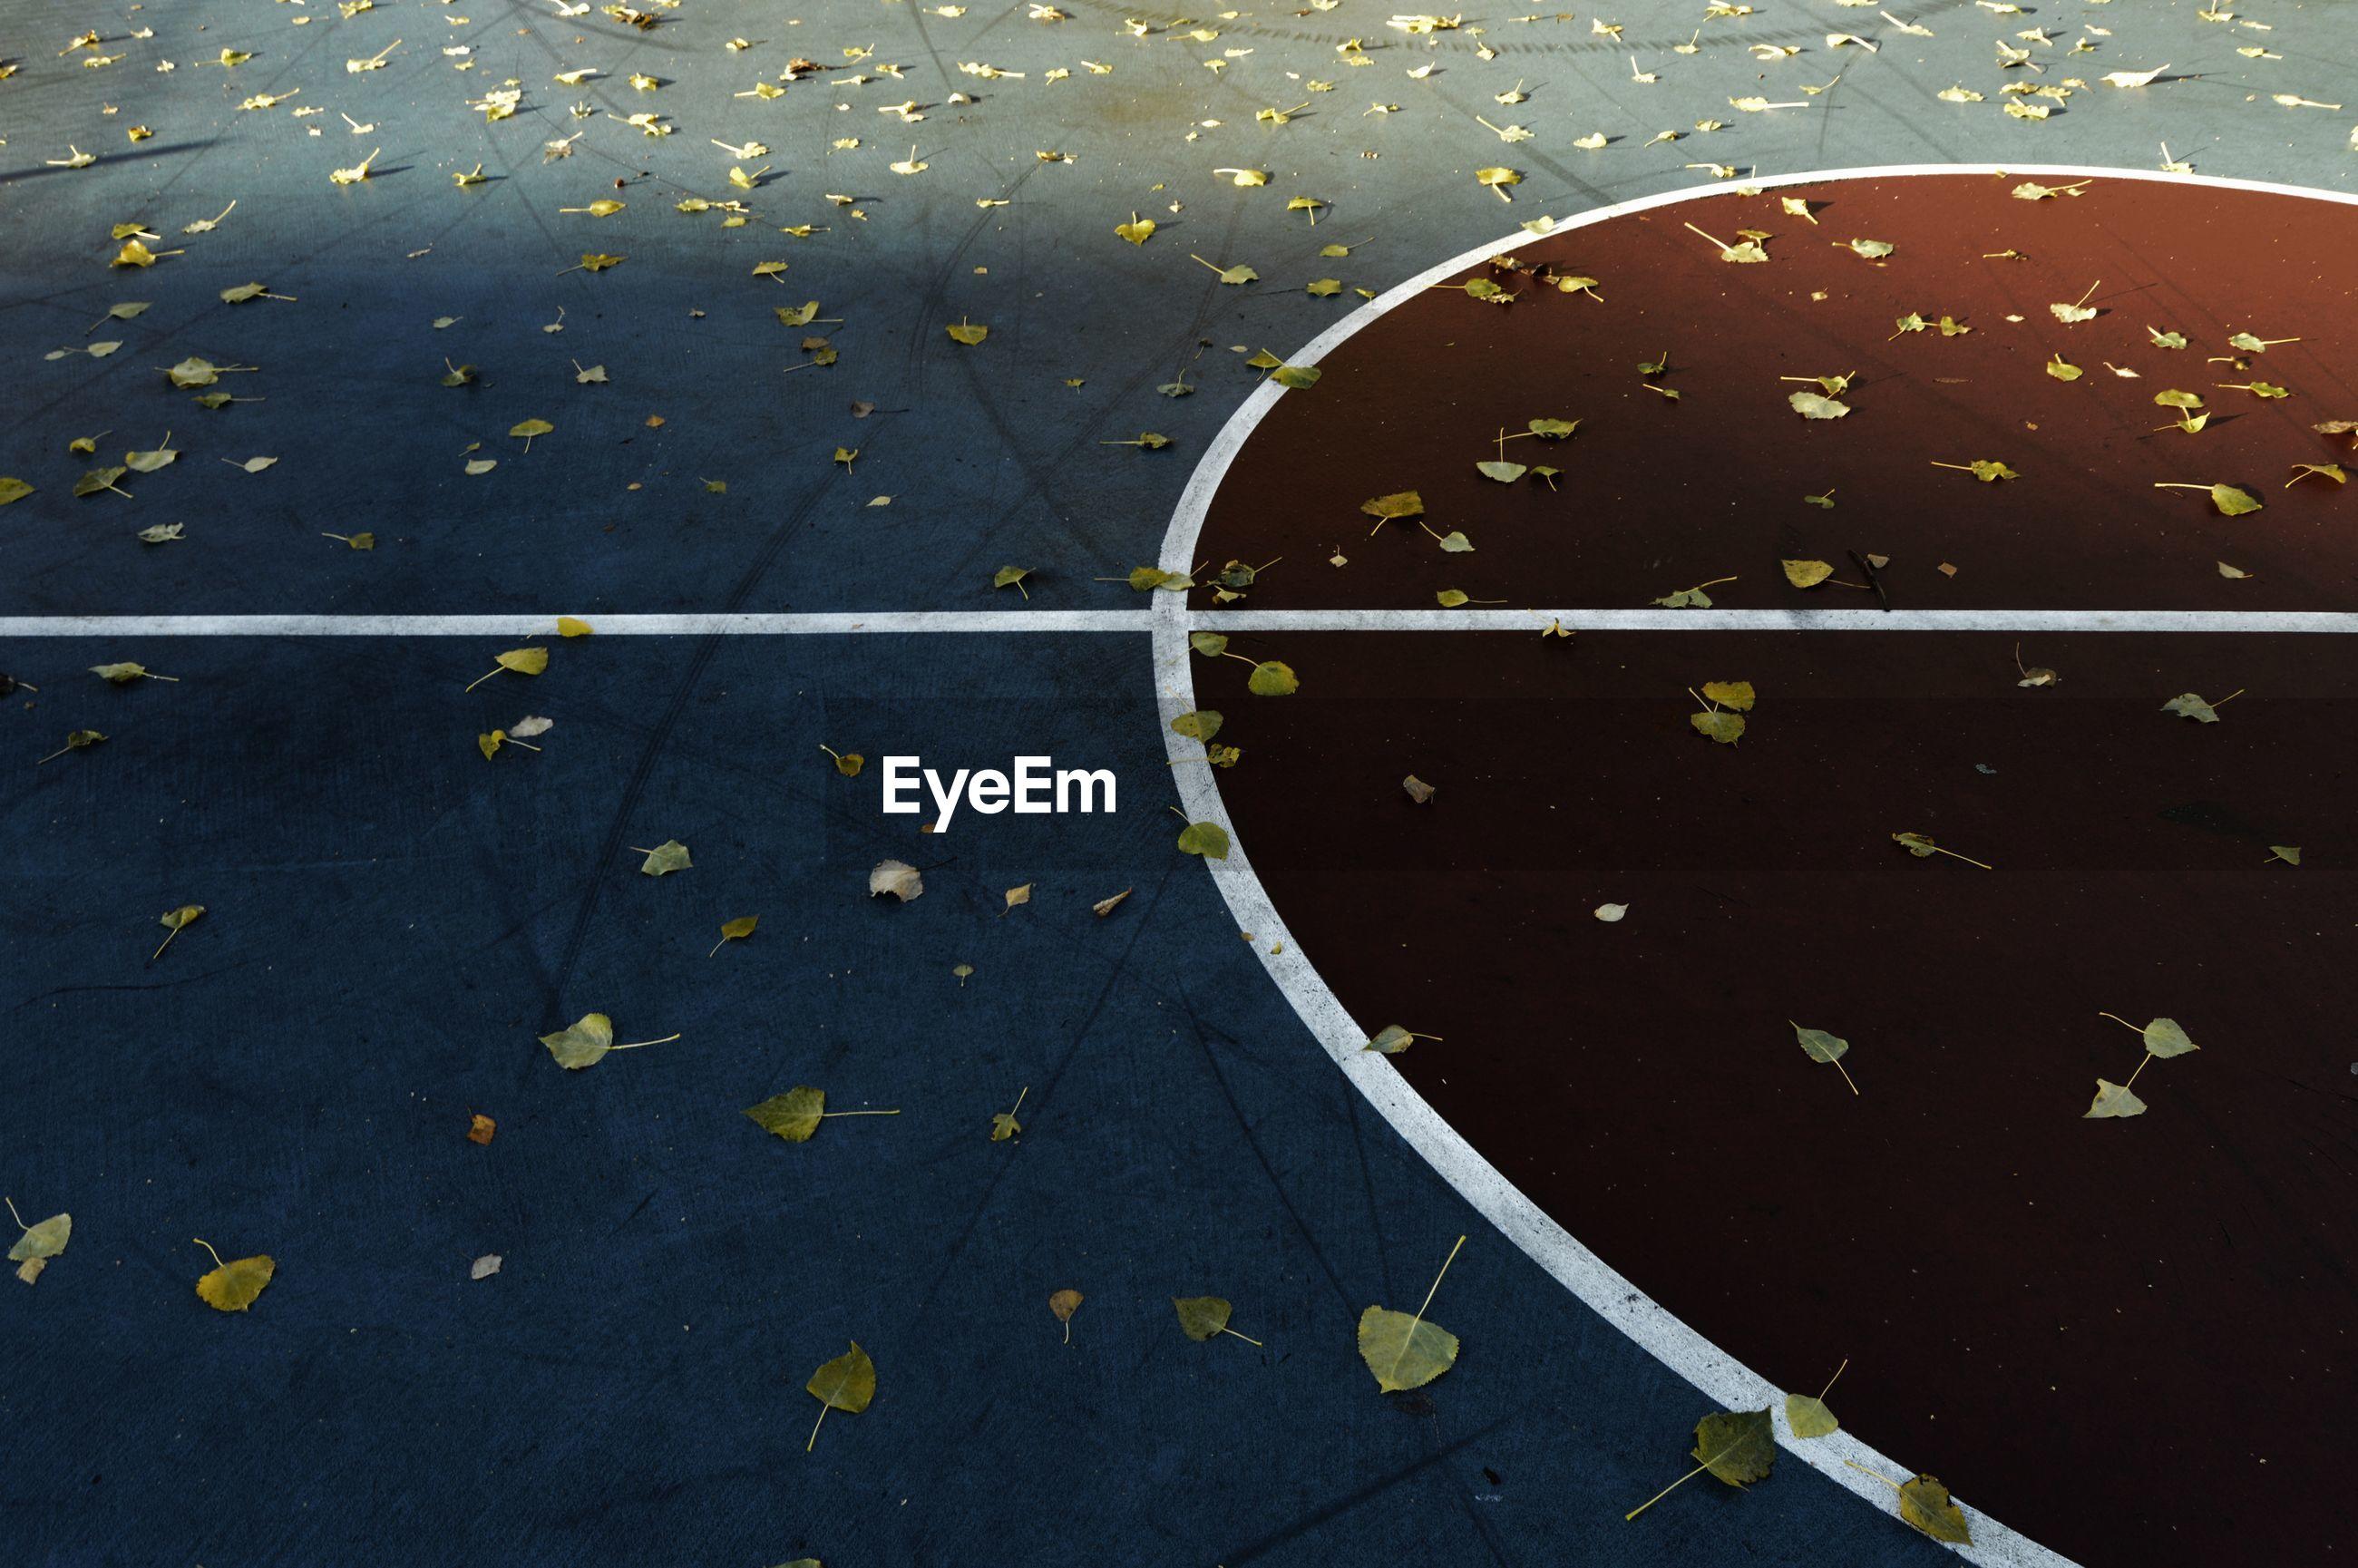 High angle view of yellow leaf on basketball court